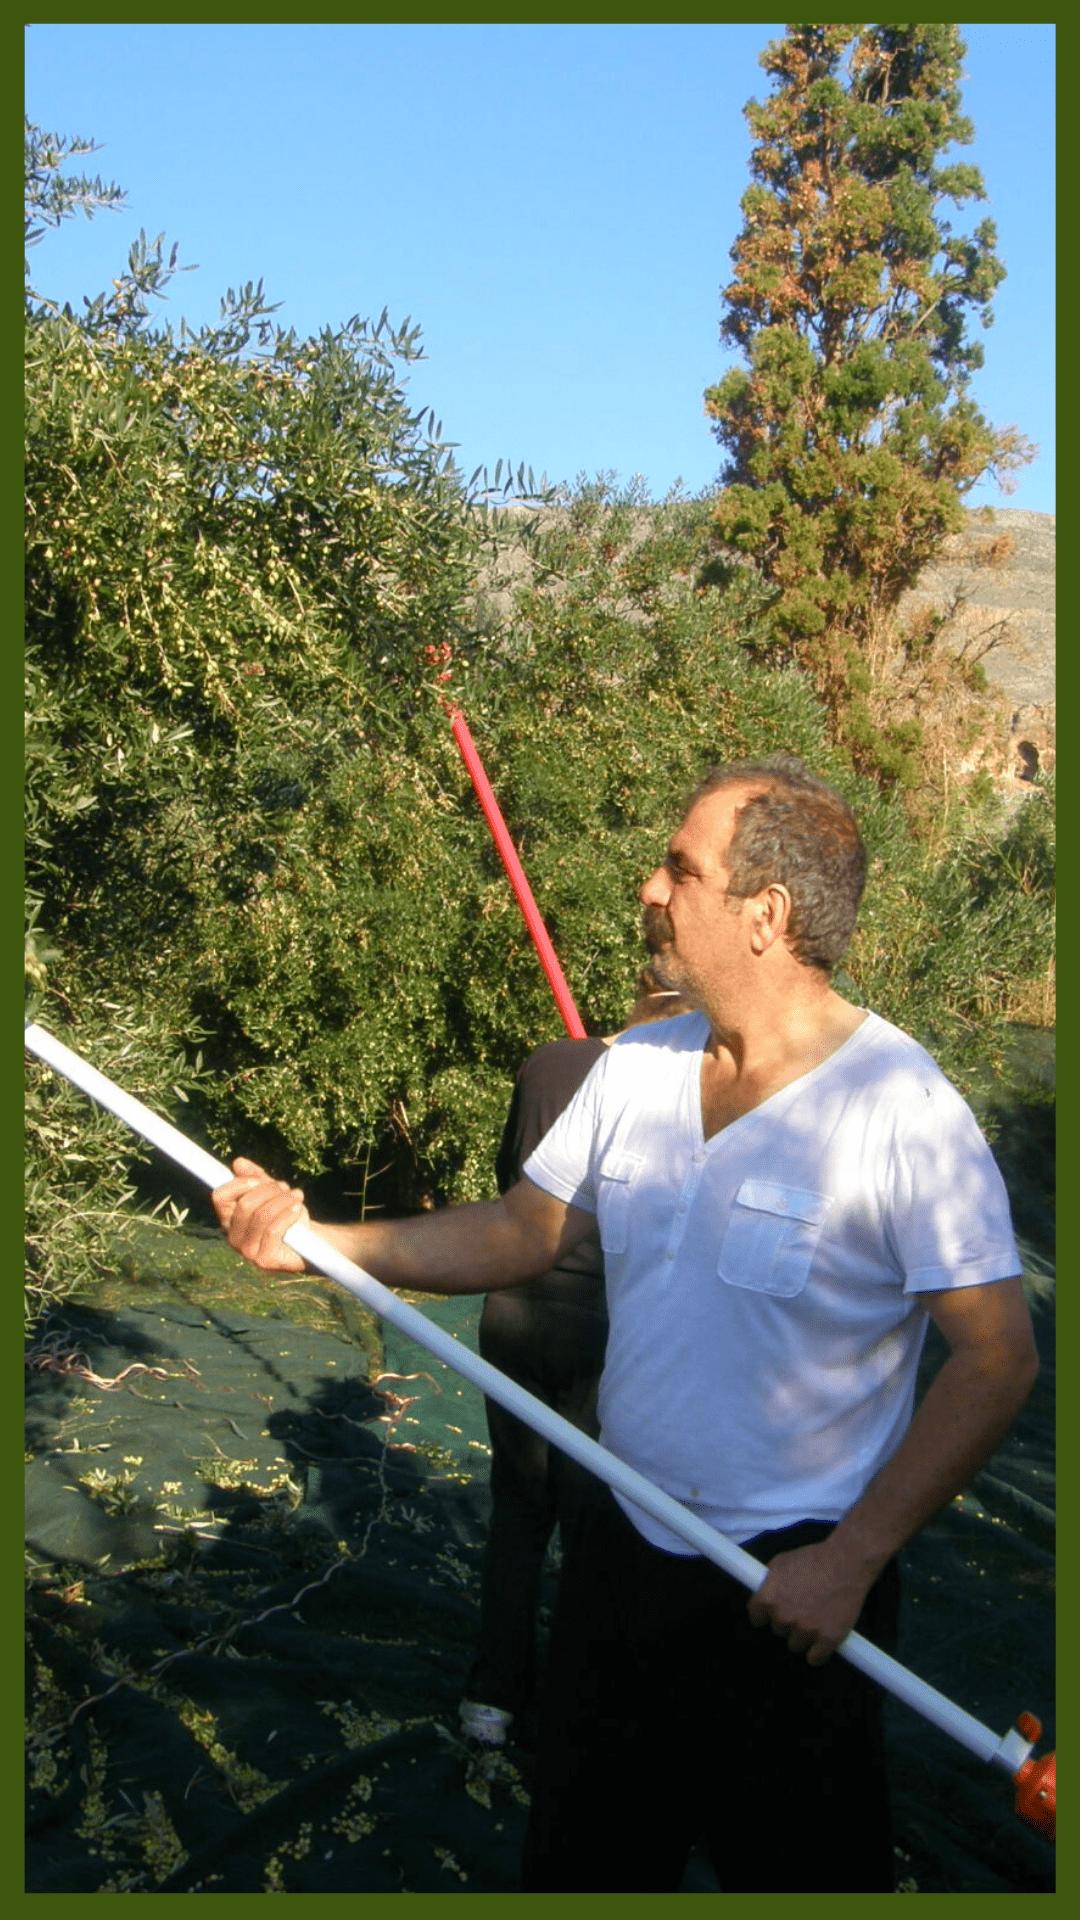 Olive Oil Harvest in Crete